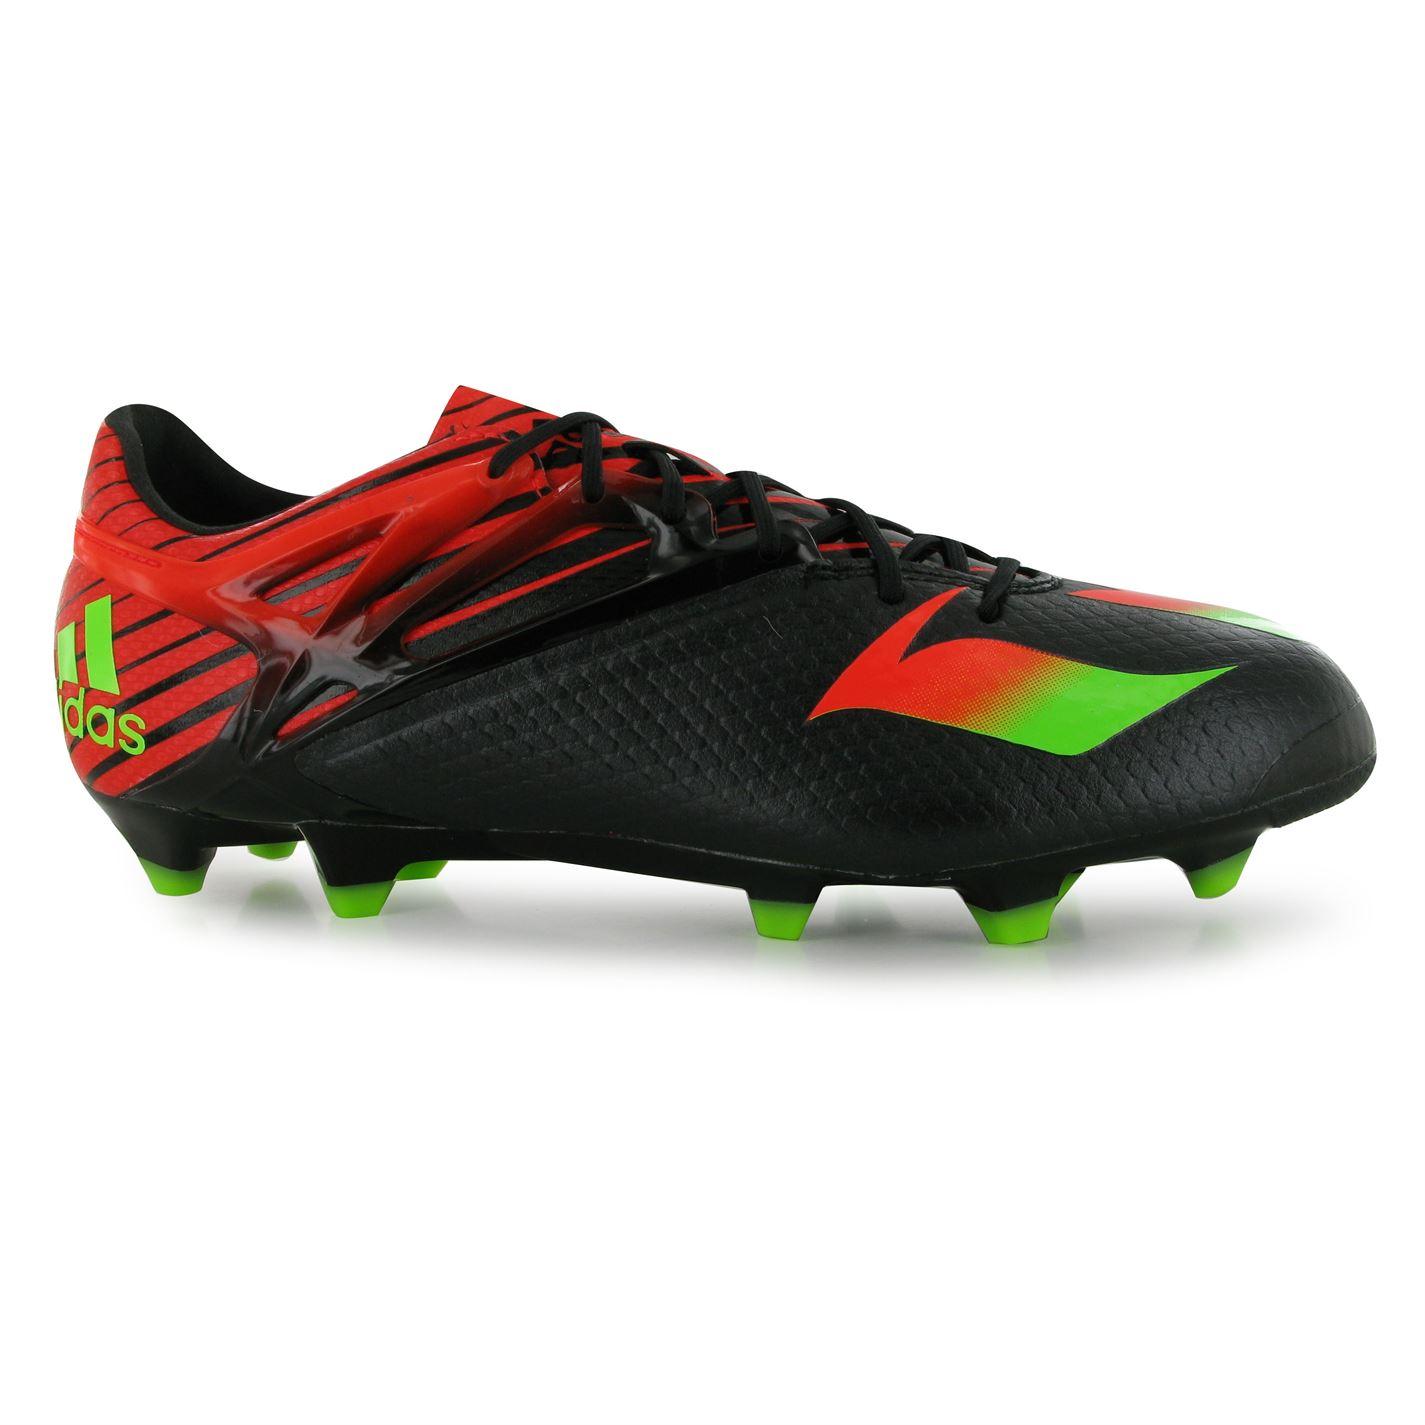 Adidas Messi 15.1 FG Mens Football Boots